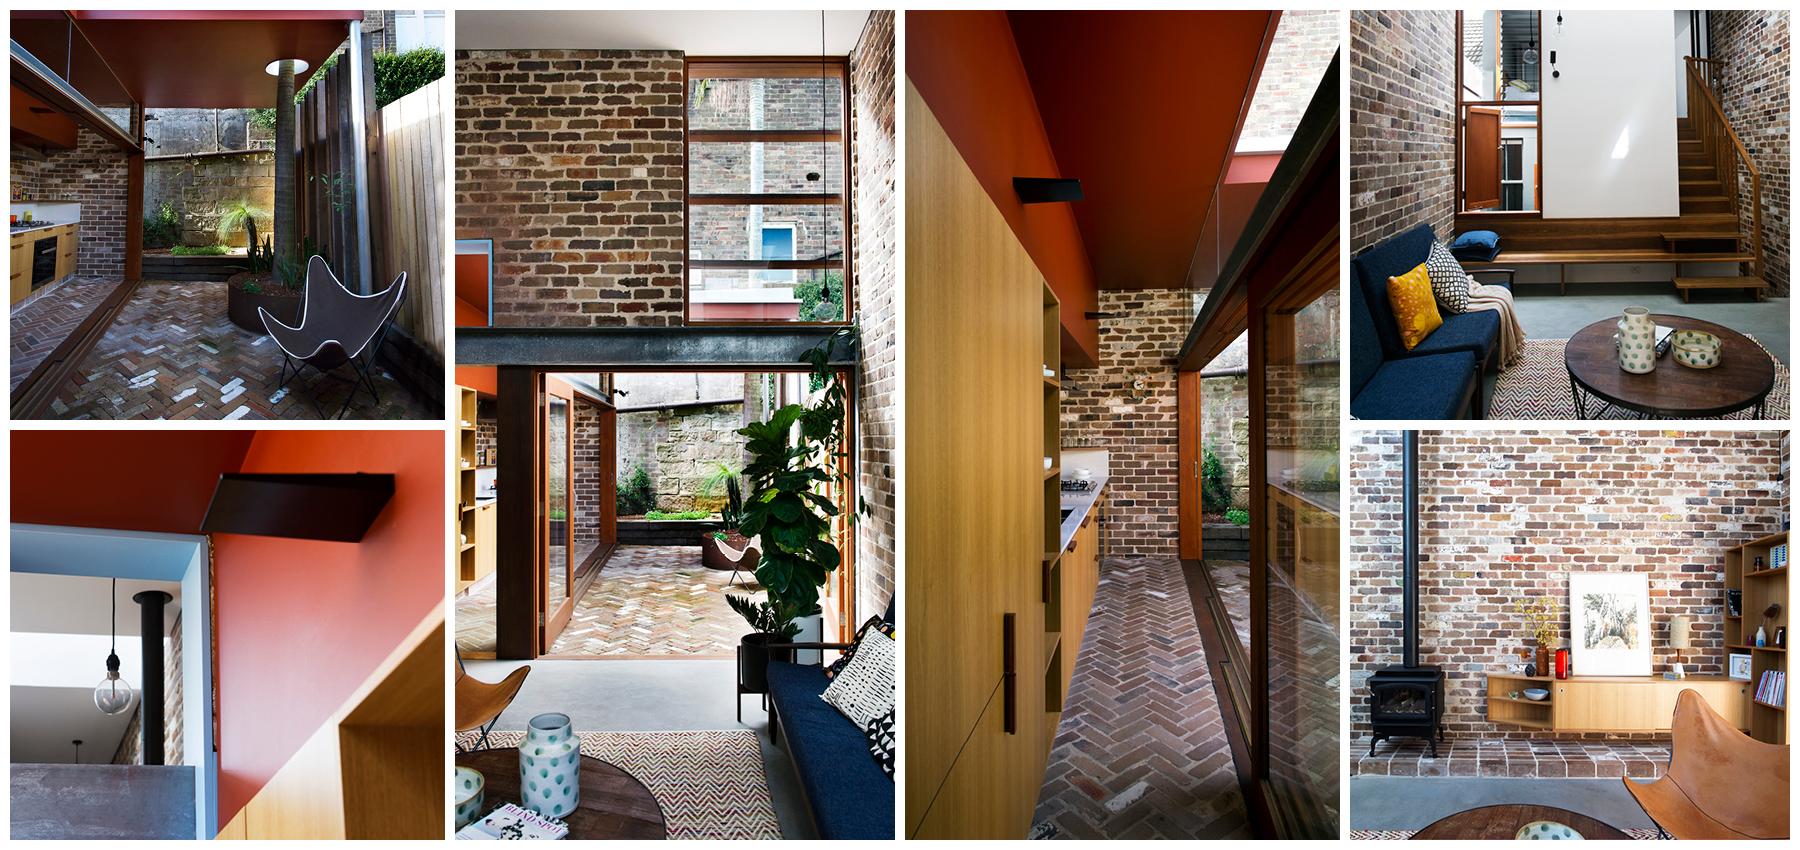 Walter Street Terrace by David Boyle Architect